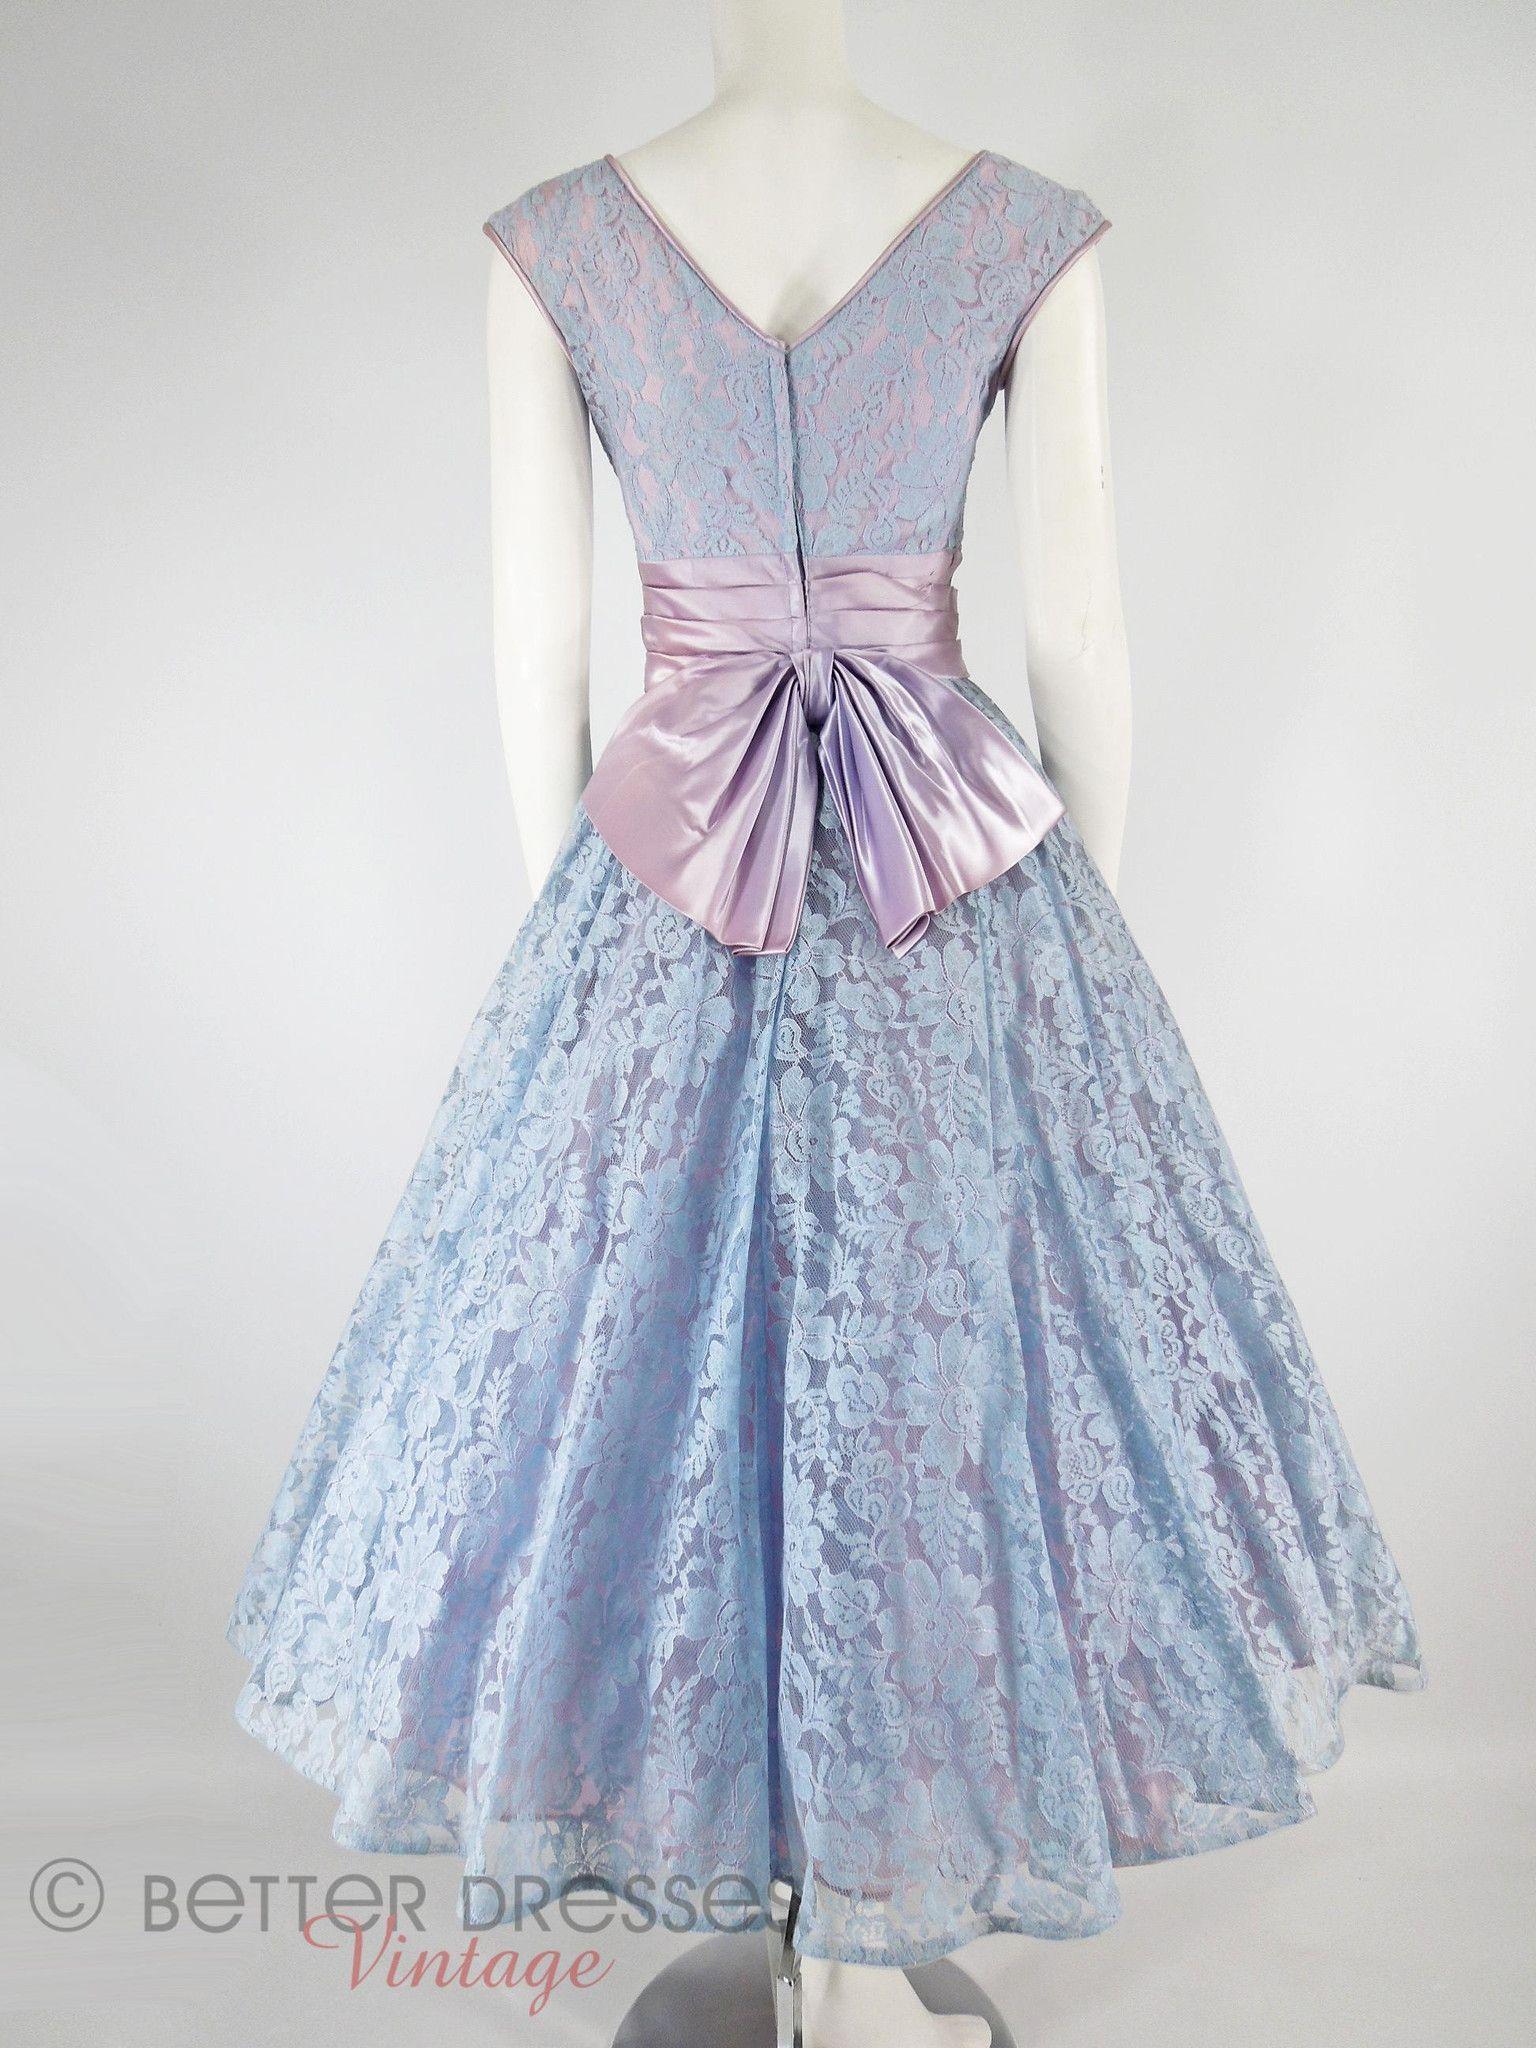 Lace dress 50s  s Lavender Full Skirt Party Dress  sm  prom dress  Pinterest